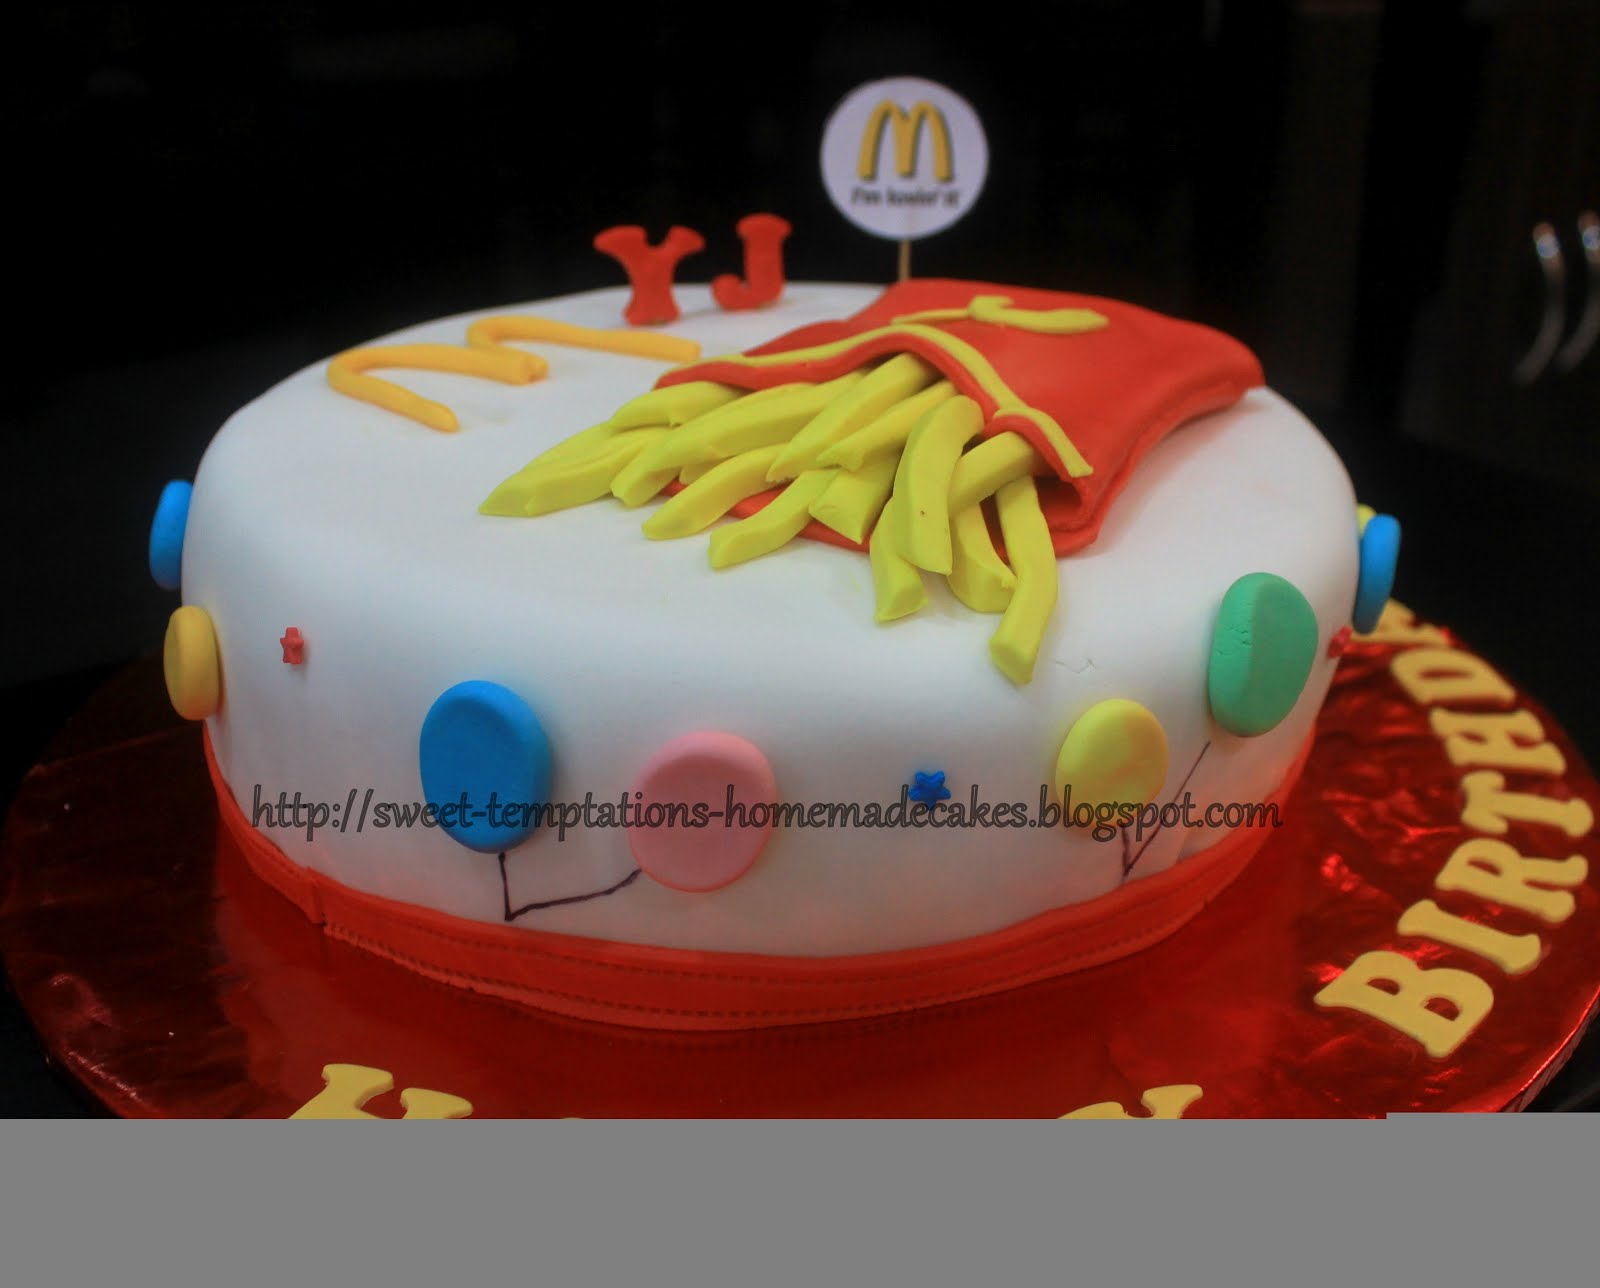 frys cakes